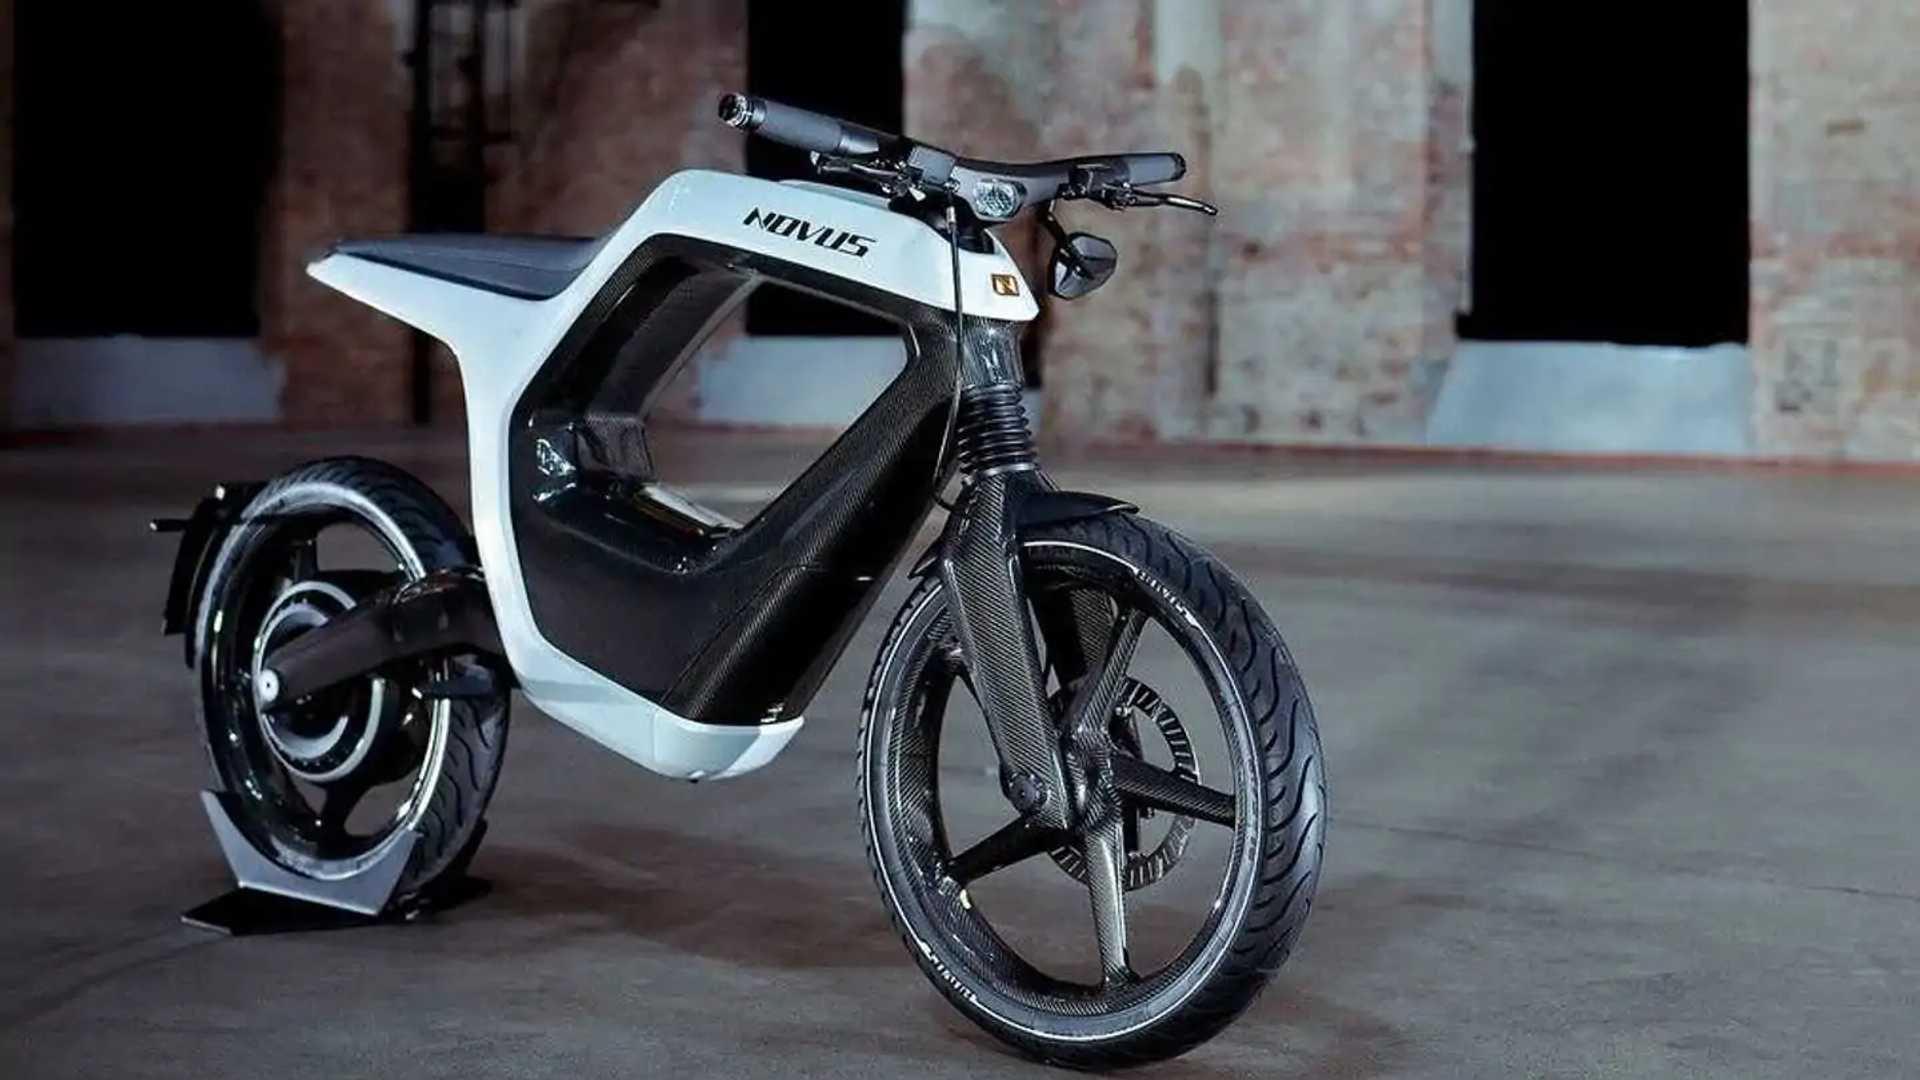 09-2020-Novus-E-Bike-169Gallery-37172c56-1723438